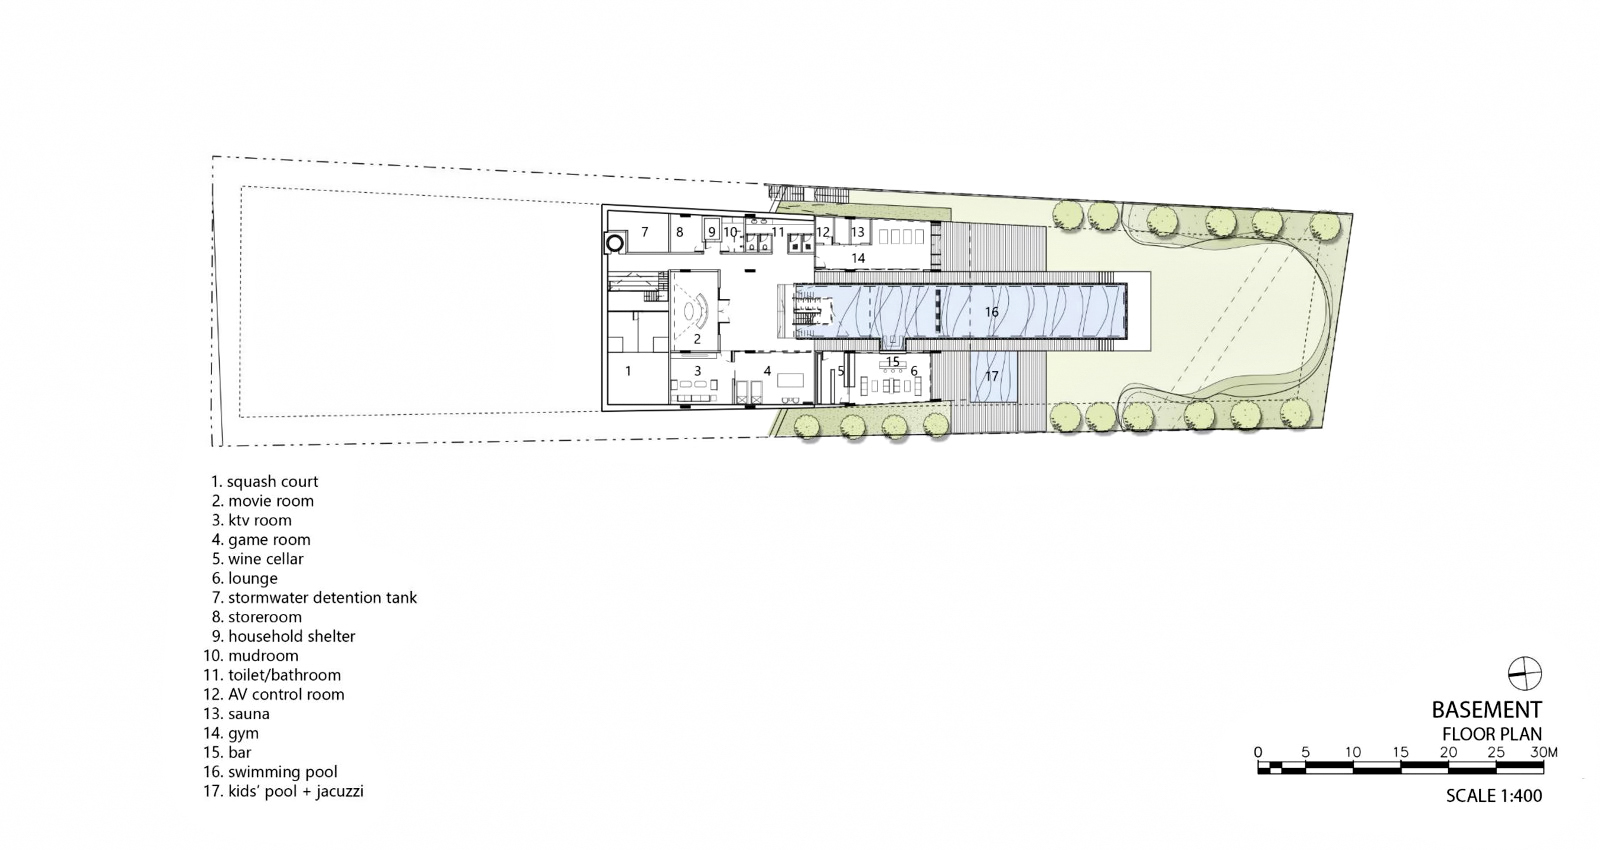 Basement Floor Plan - Hidden House Luxury Estate - Ridout Road, Singapore